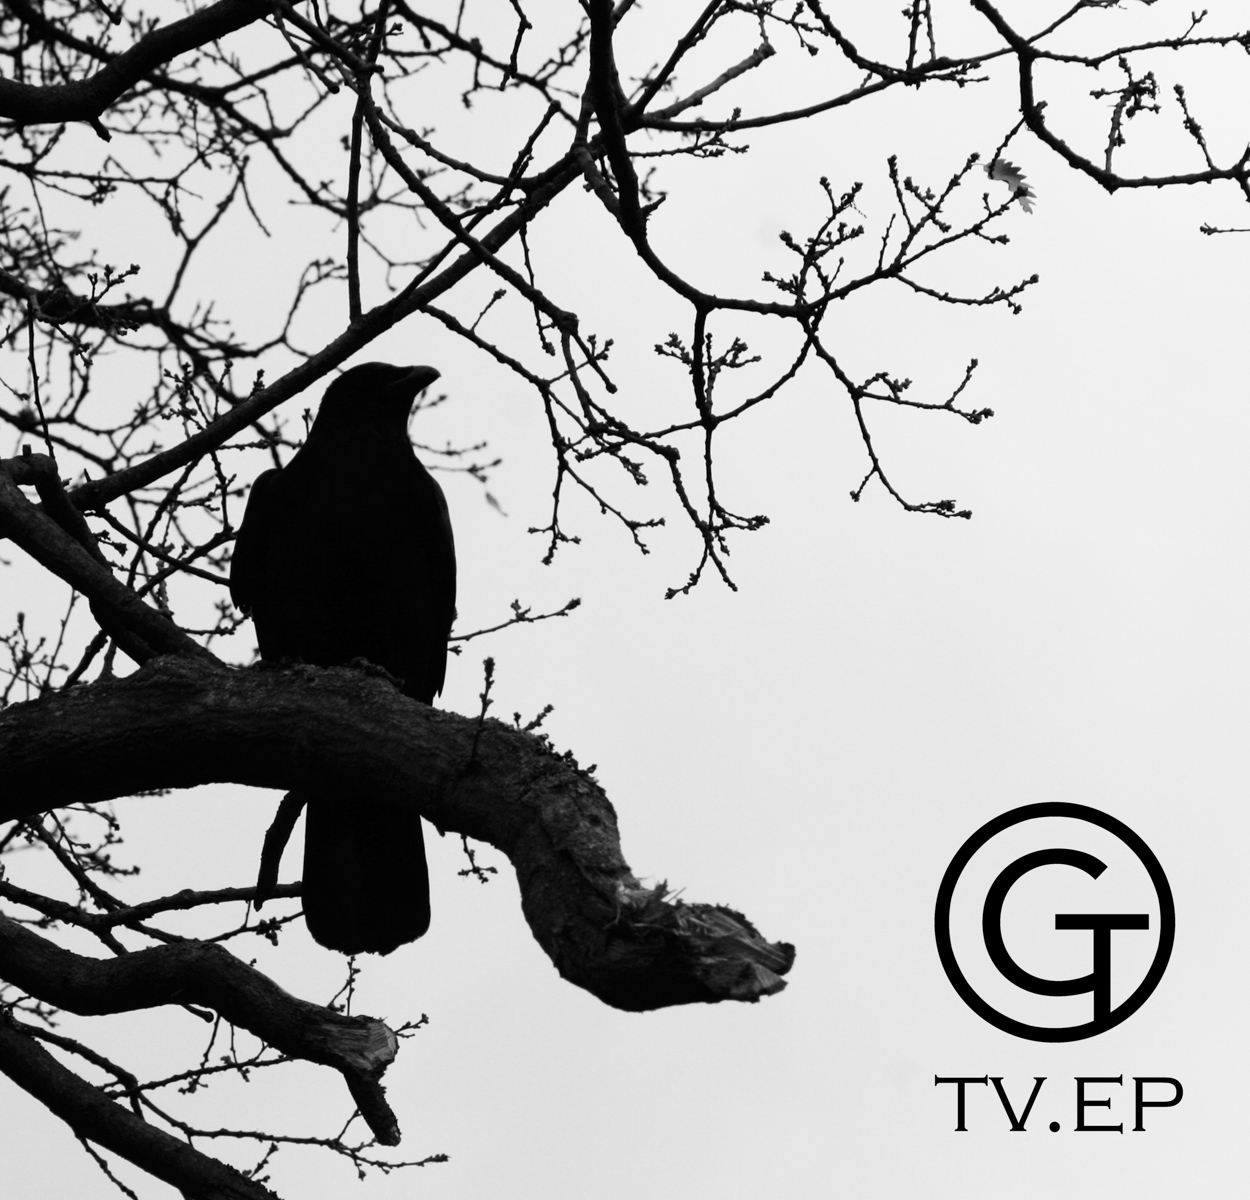 birds treee.jpg